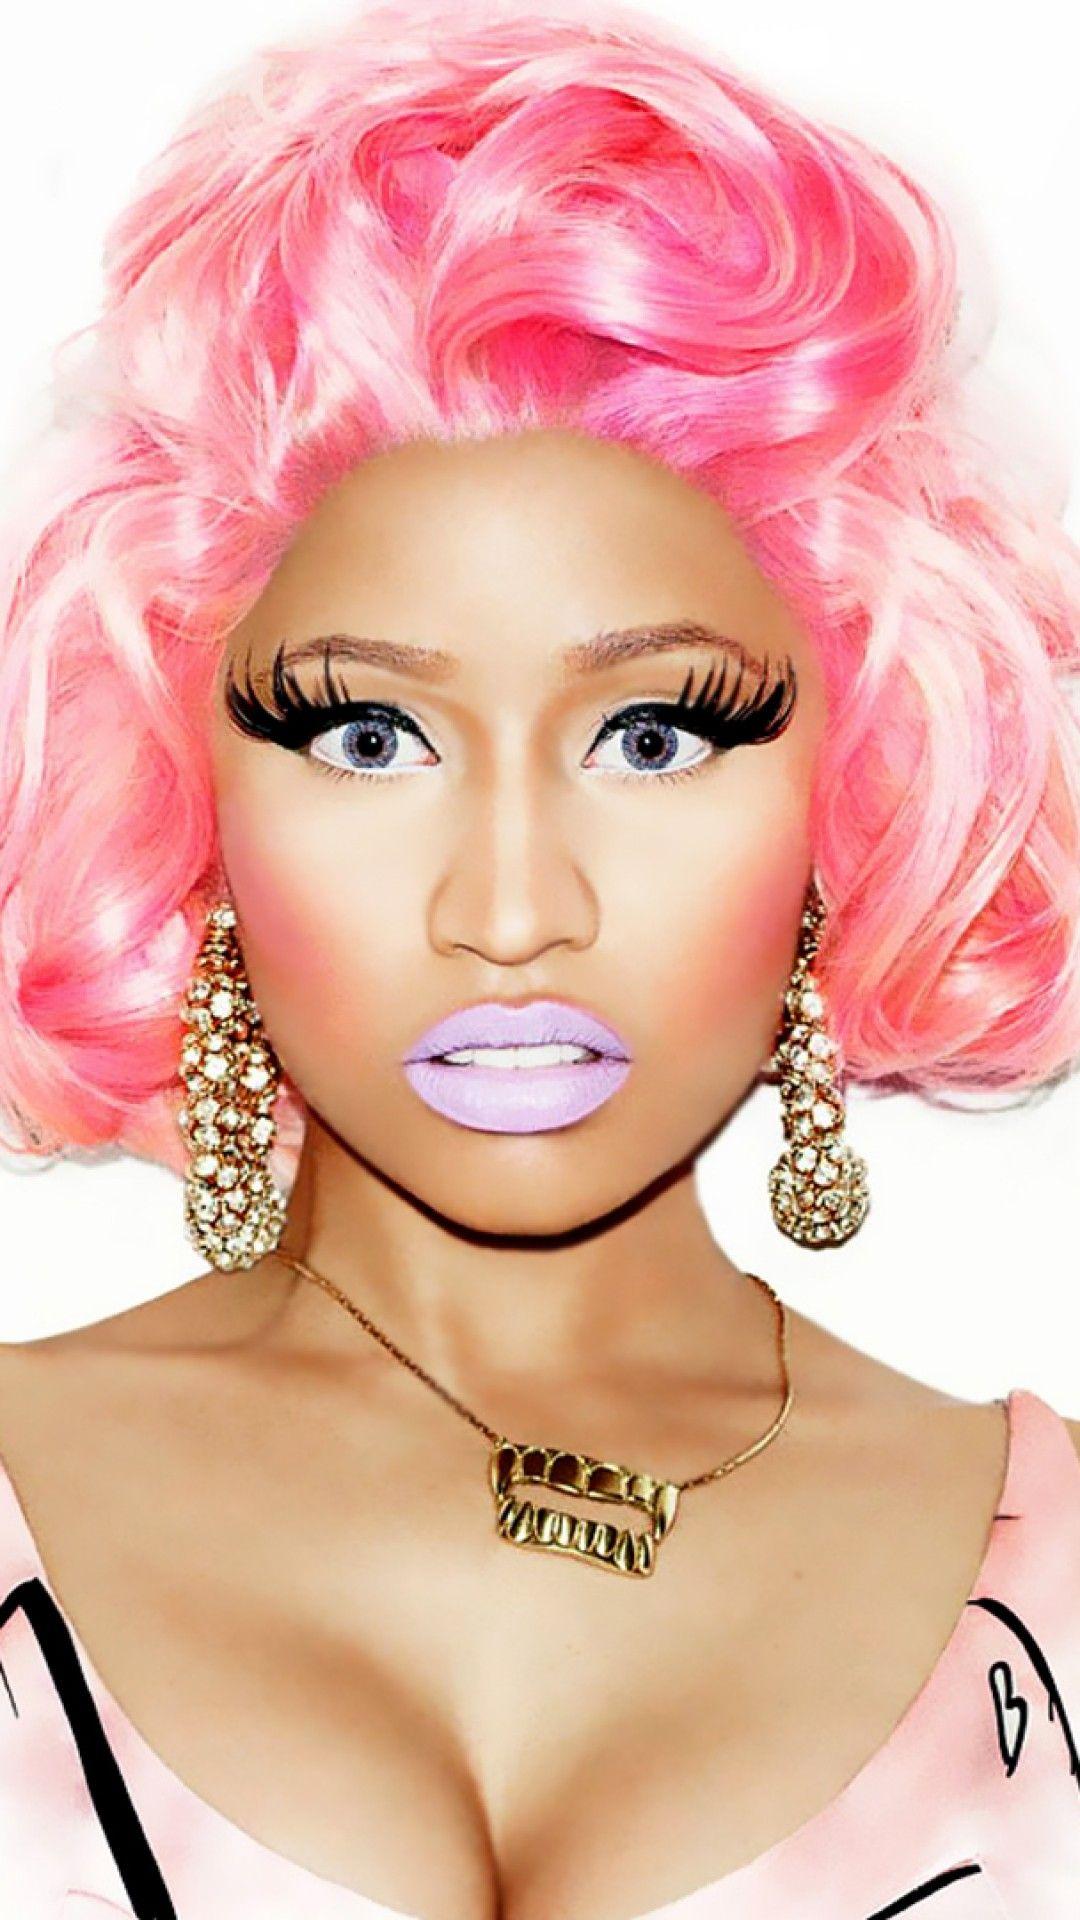 Wallpaper Phone Nicki Minaj Full HD Celebrity short